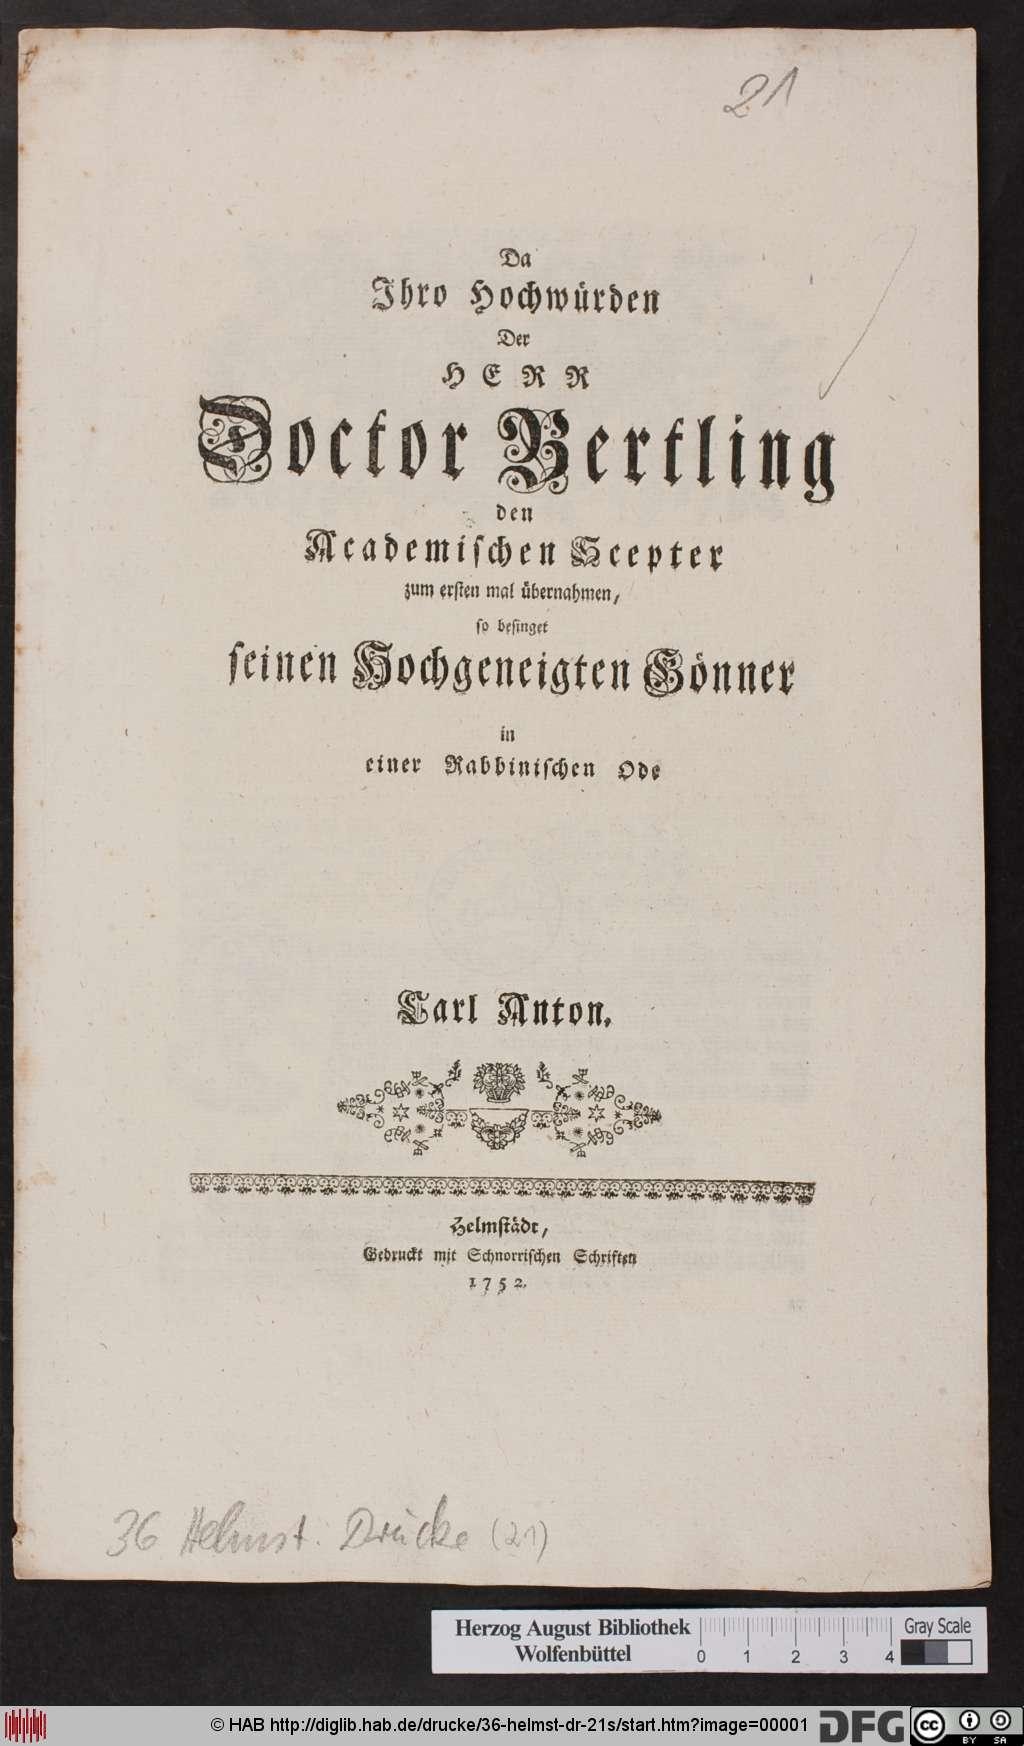 https://diglib.hab.de/drucke/36-helmst-dr-21s/00001.jpg